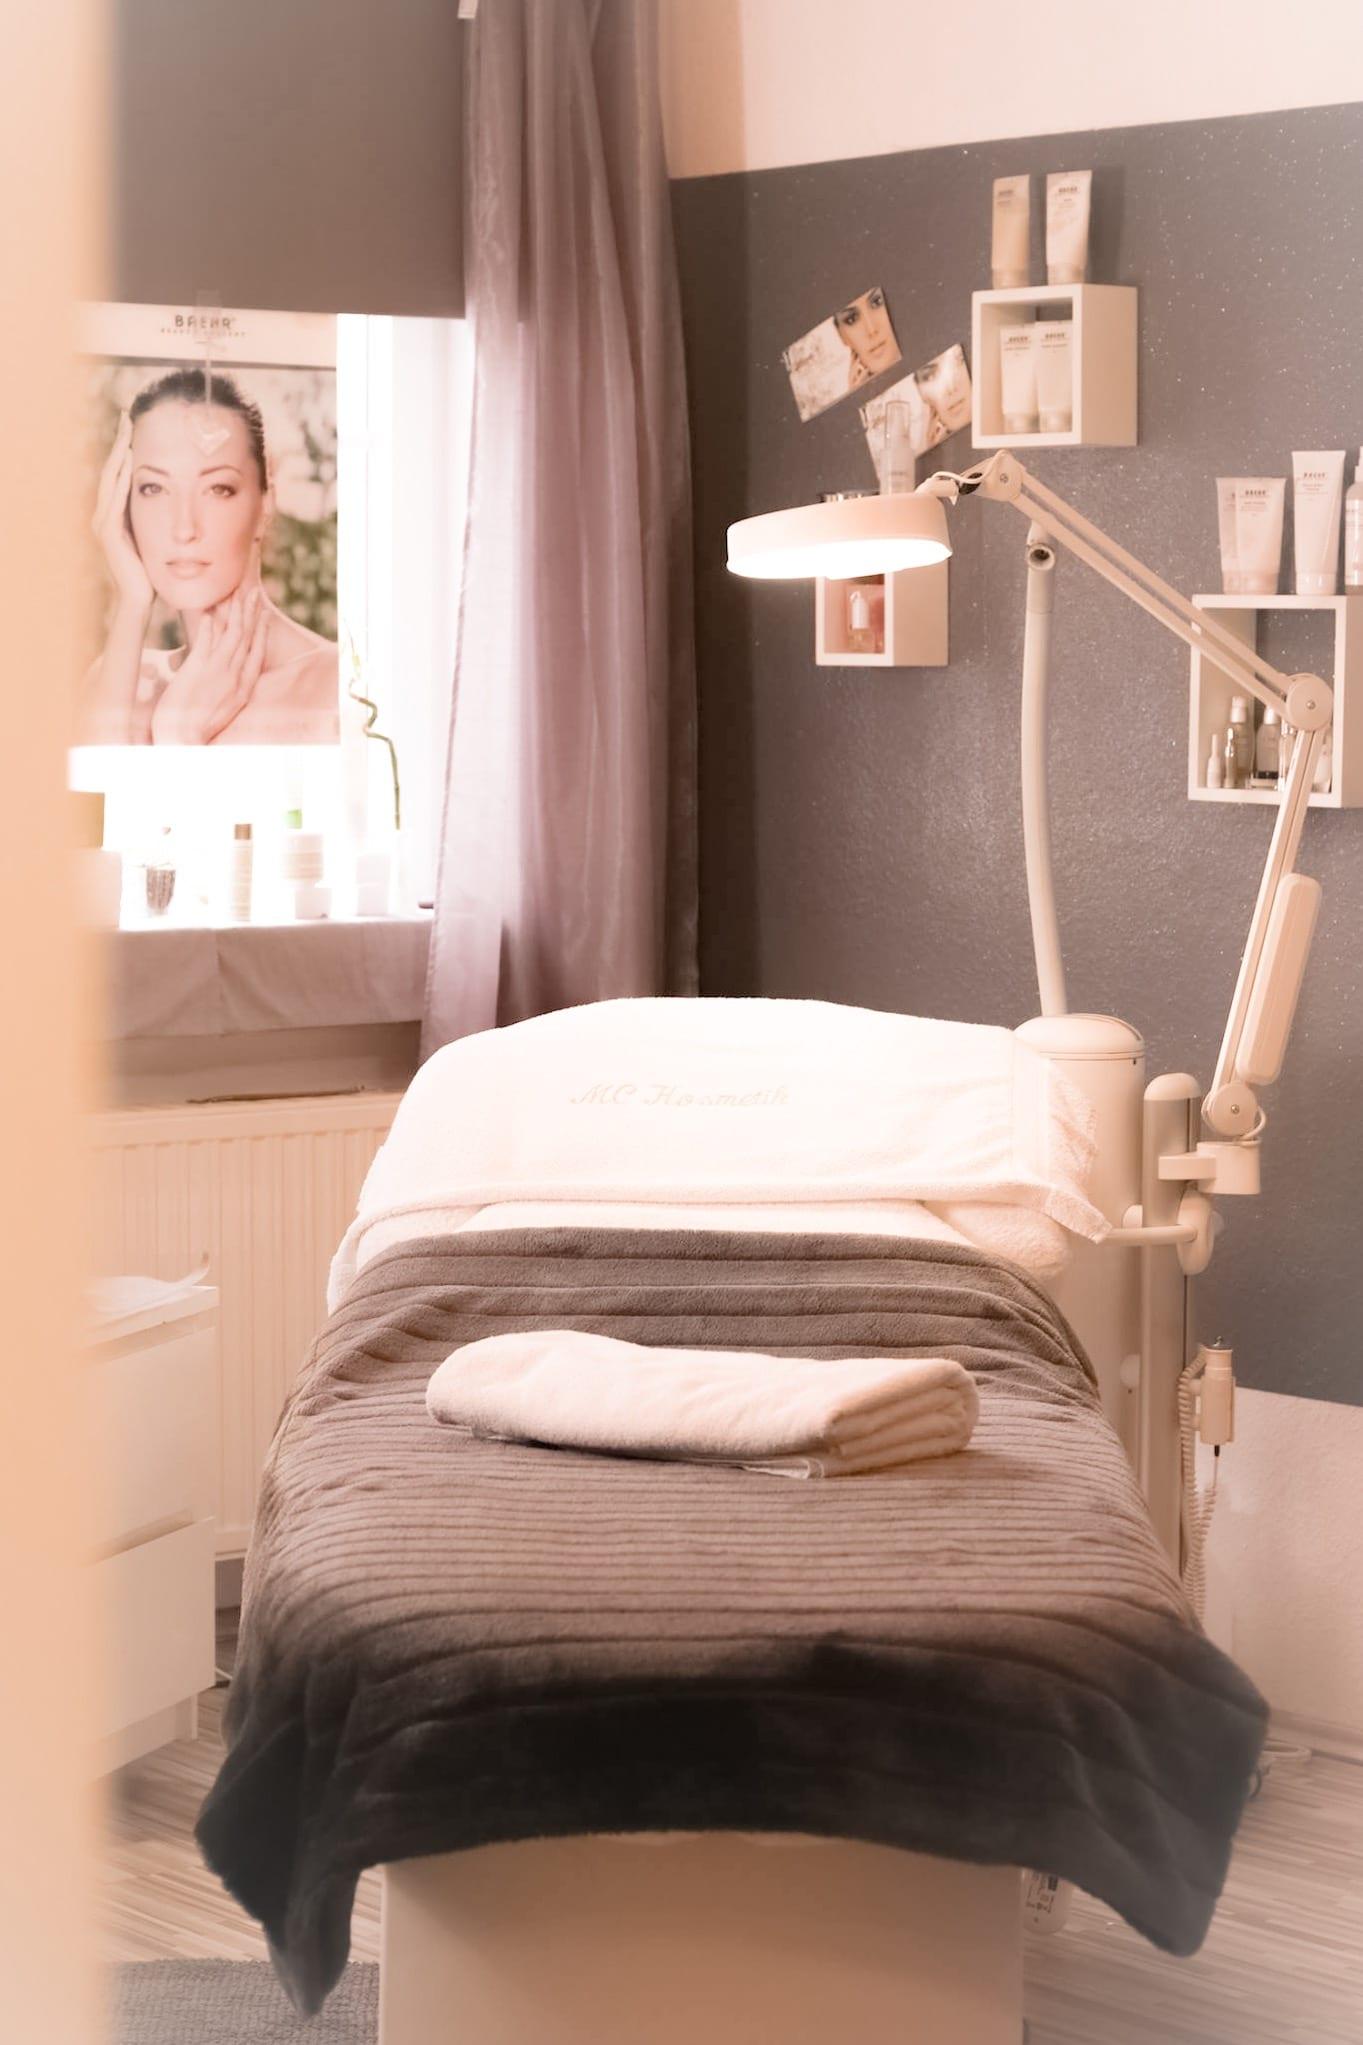 beautysalon in saarbr cken frau schirra bloggt. Black Bedroom Furniture Sets. Home Design Ideas